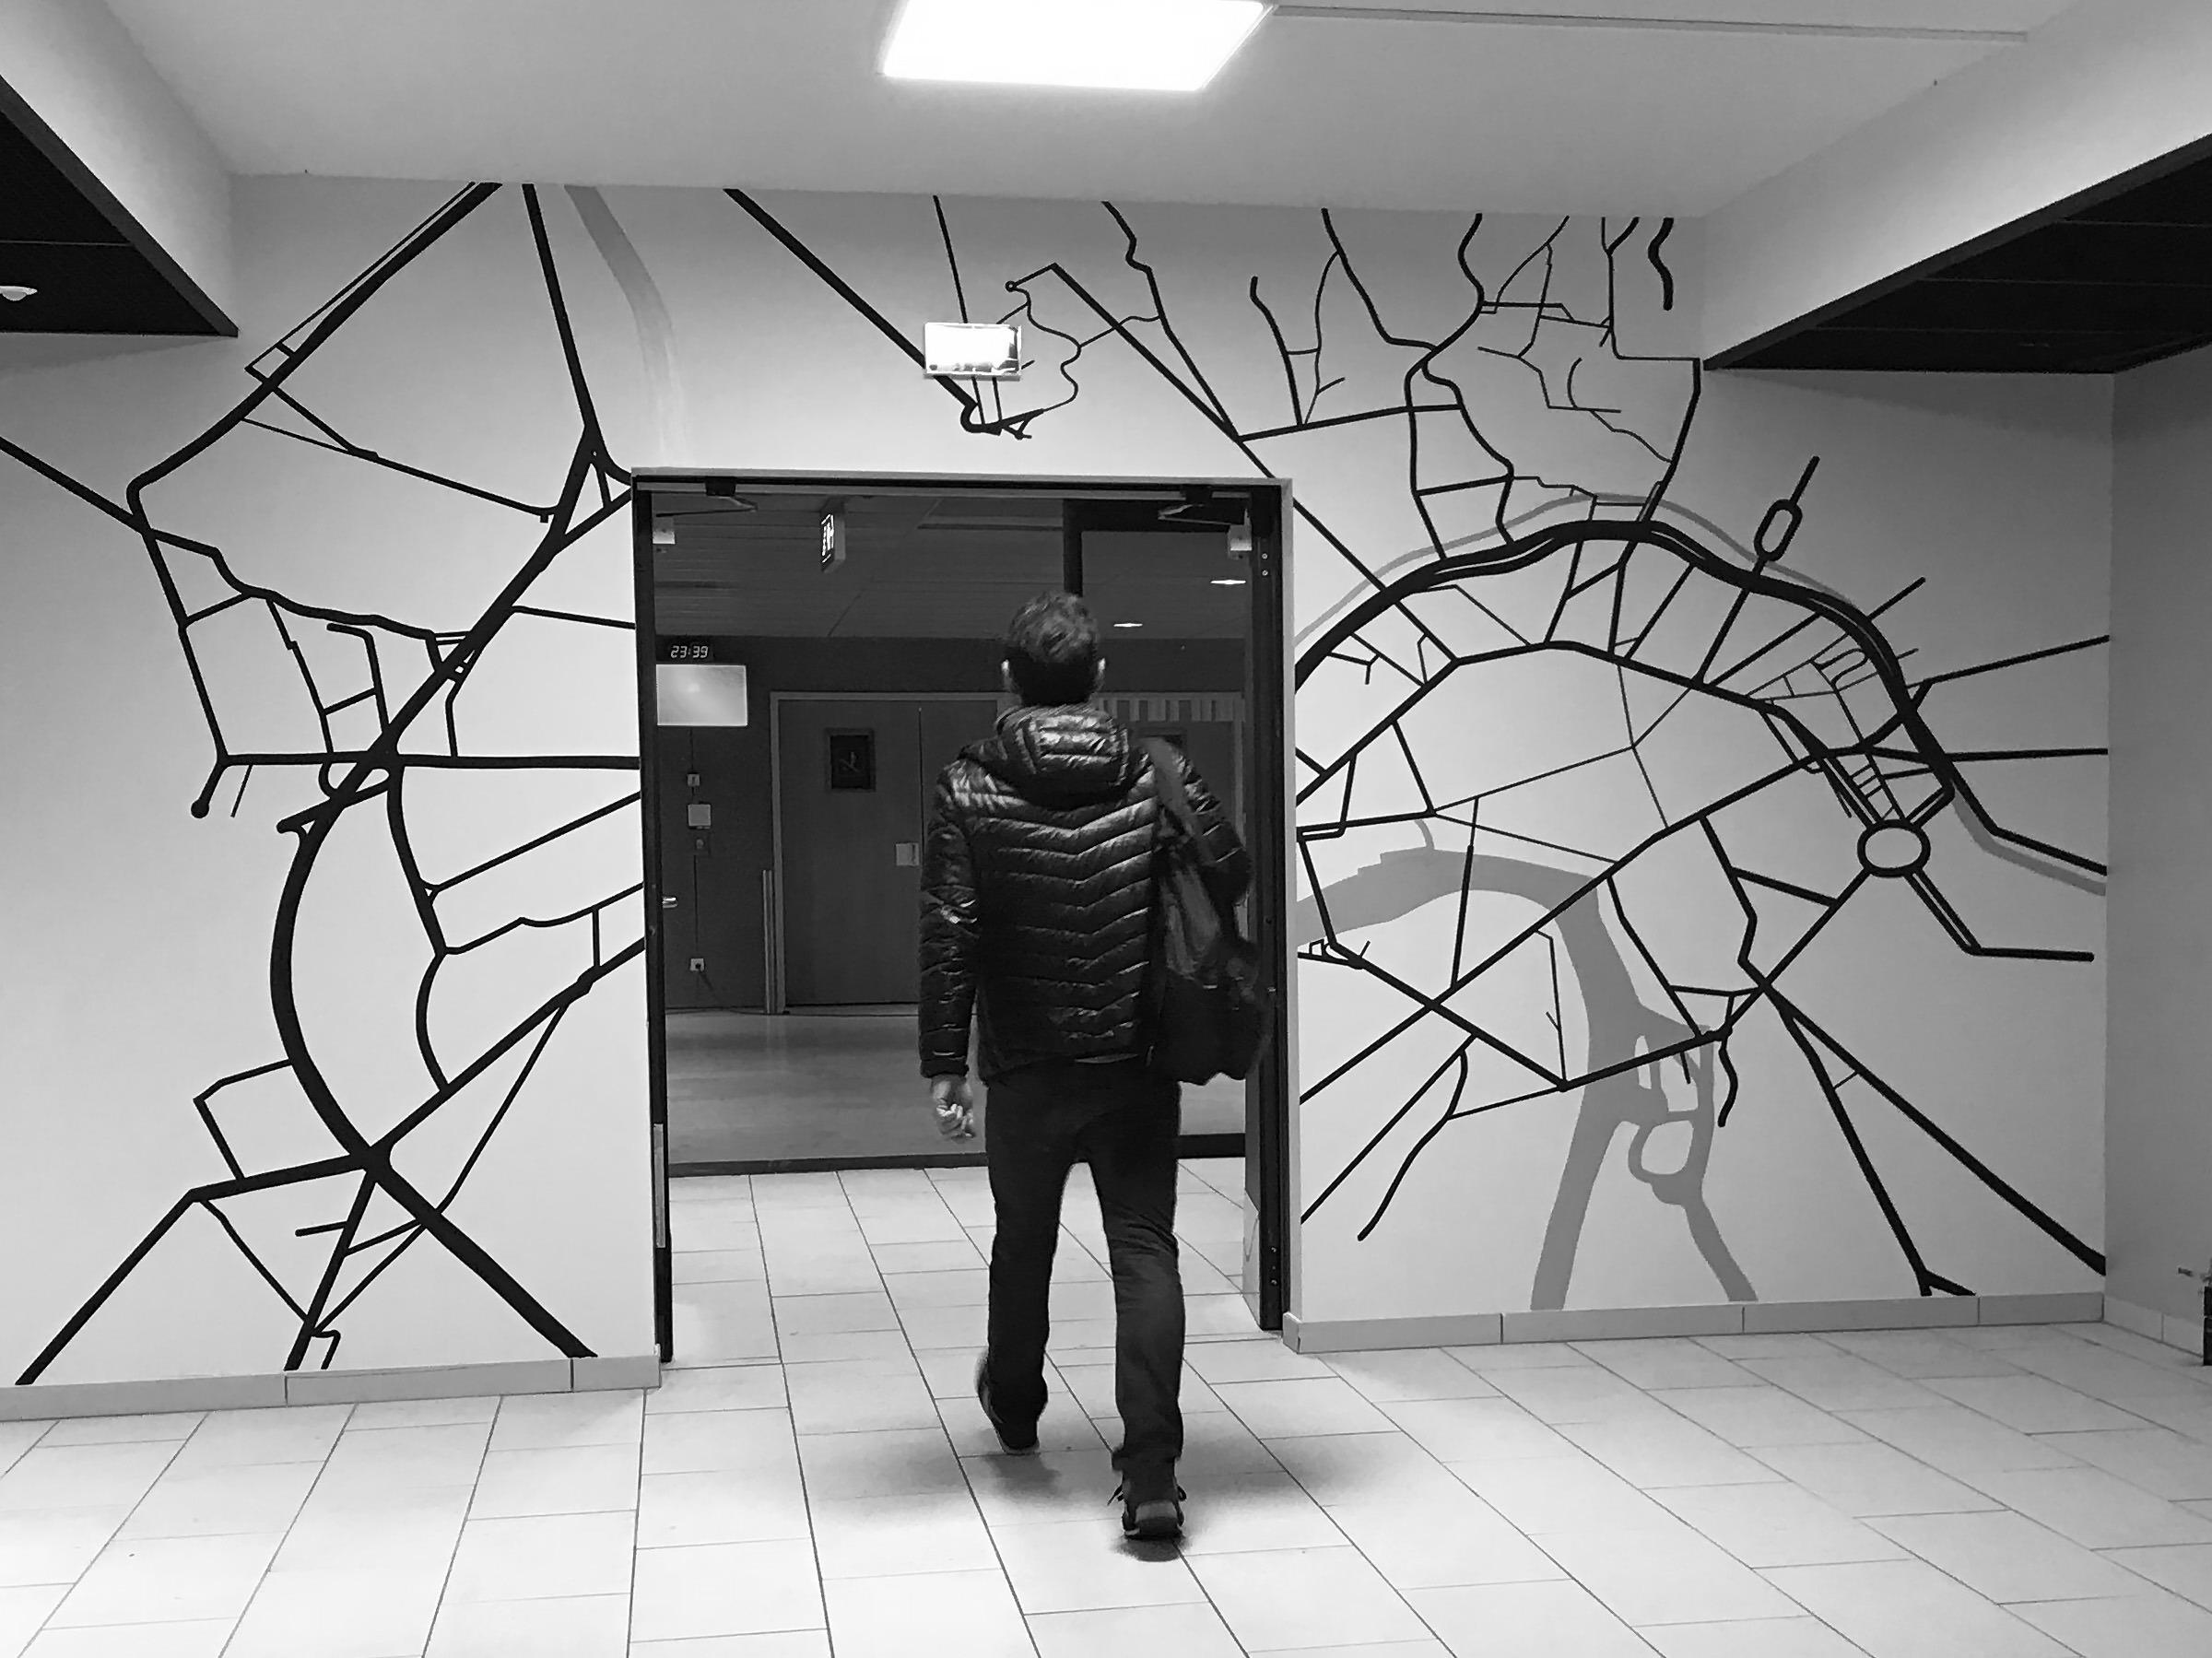 lines-mural-peinture-moderne-decor